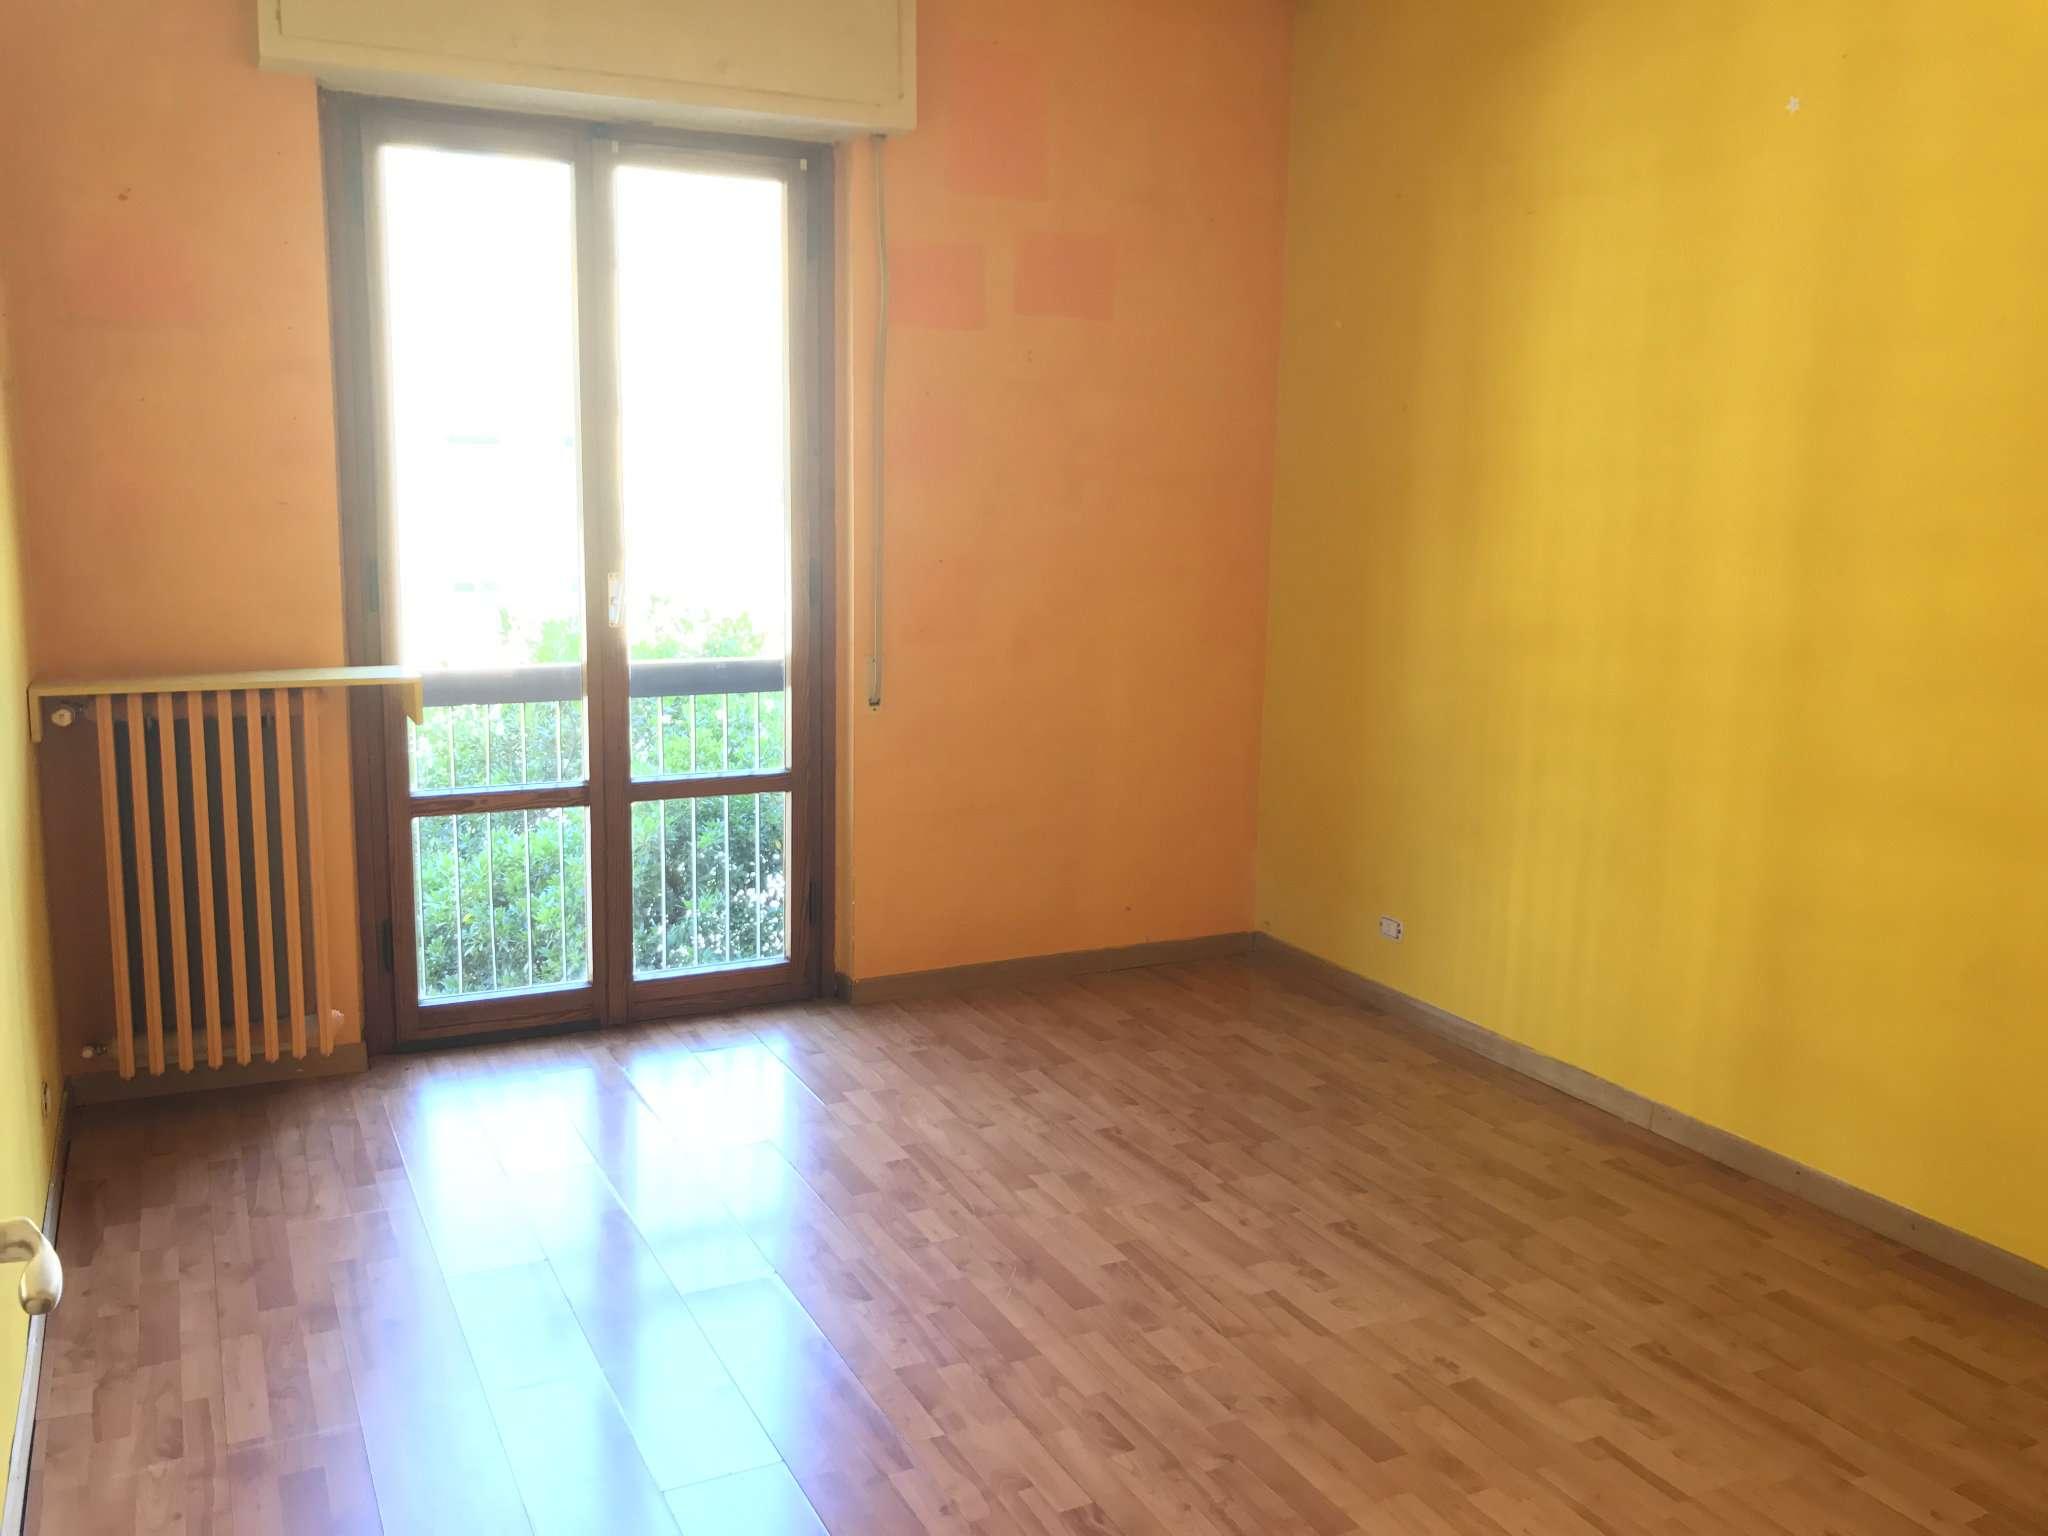 Appartamento in Vendita a Firenze Periferia Nord: 4 locali, 115 mq